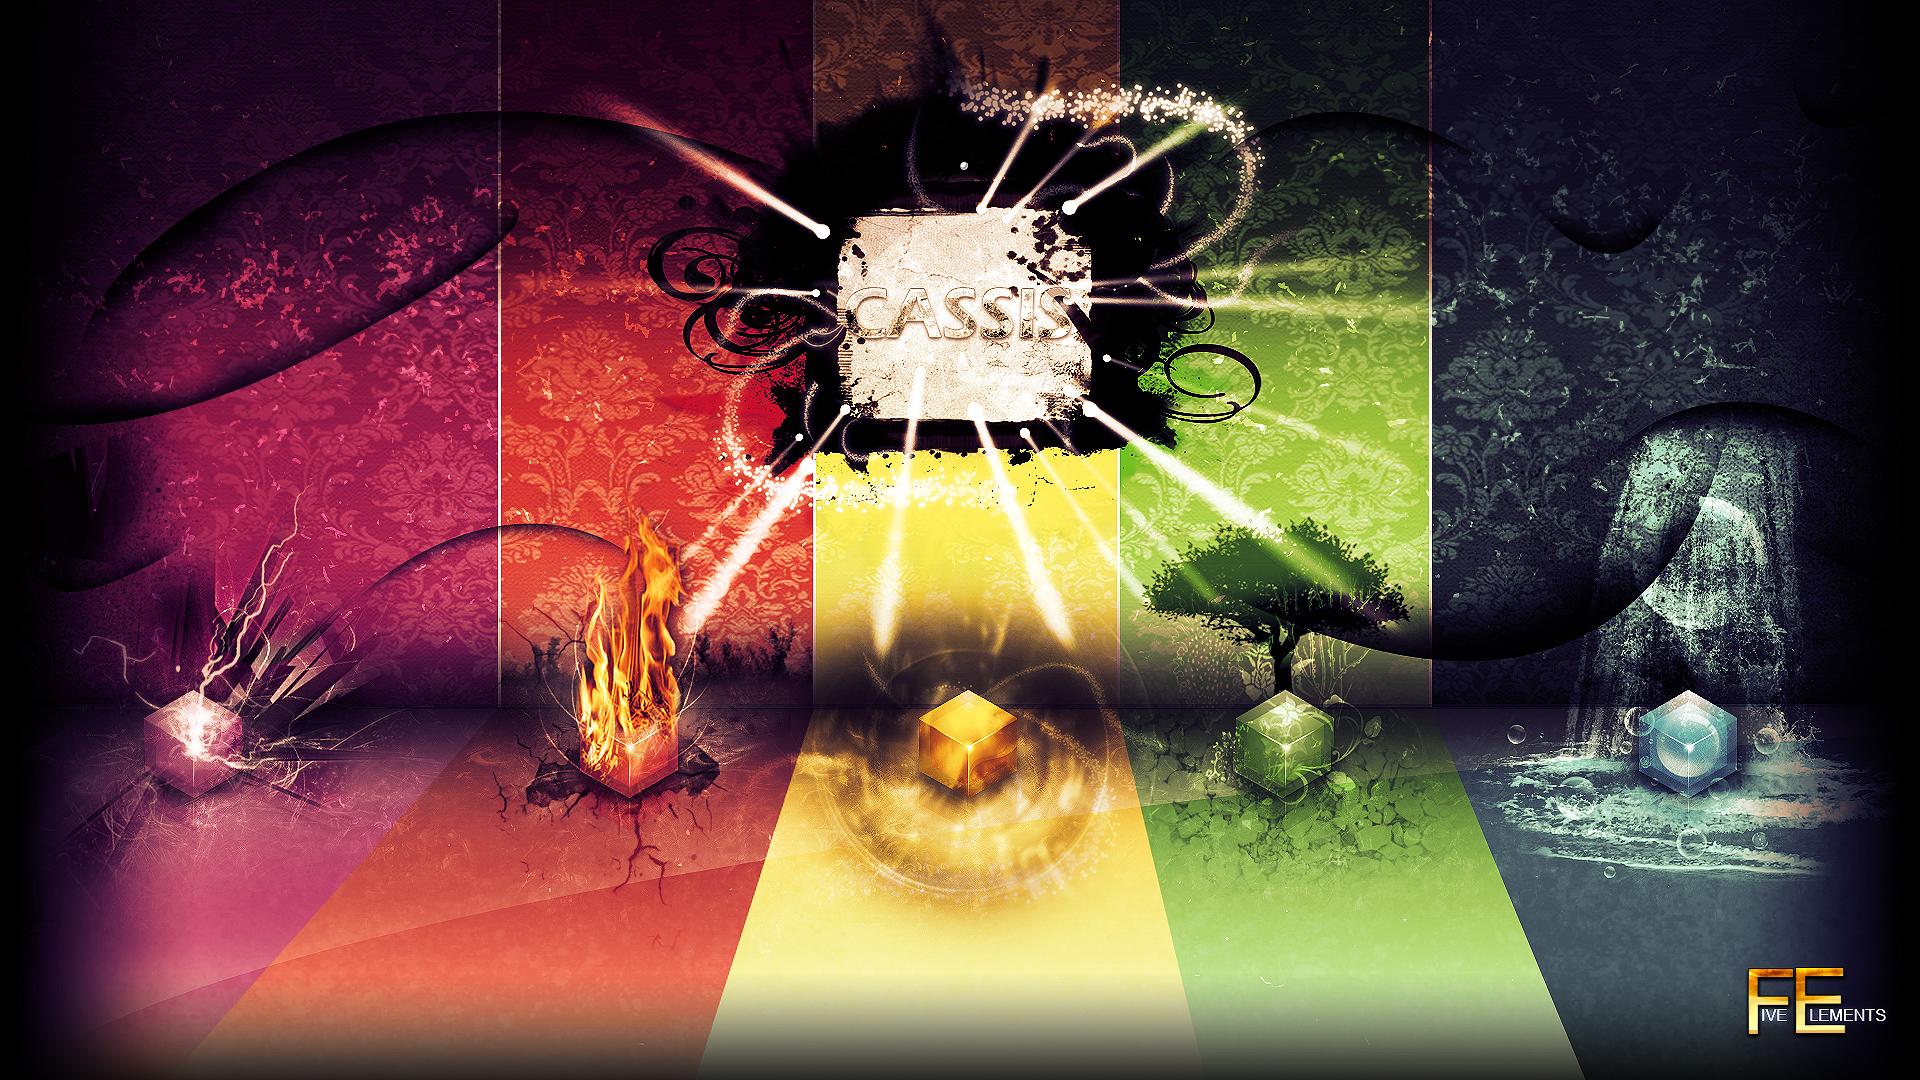 Five Elements Art : Cassis wallapper five elements by petit on deviantart